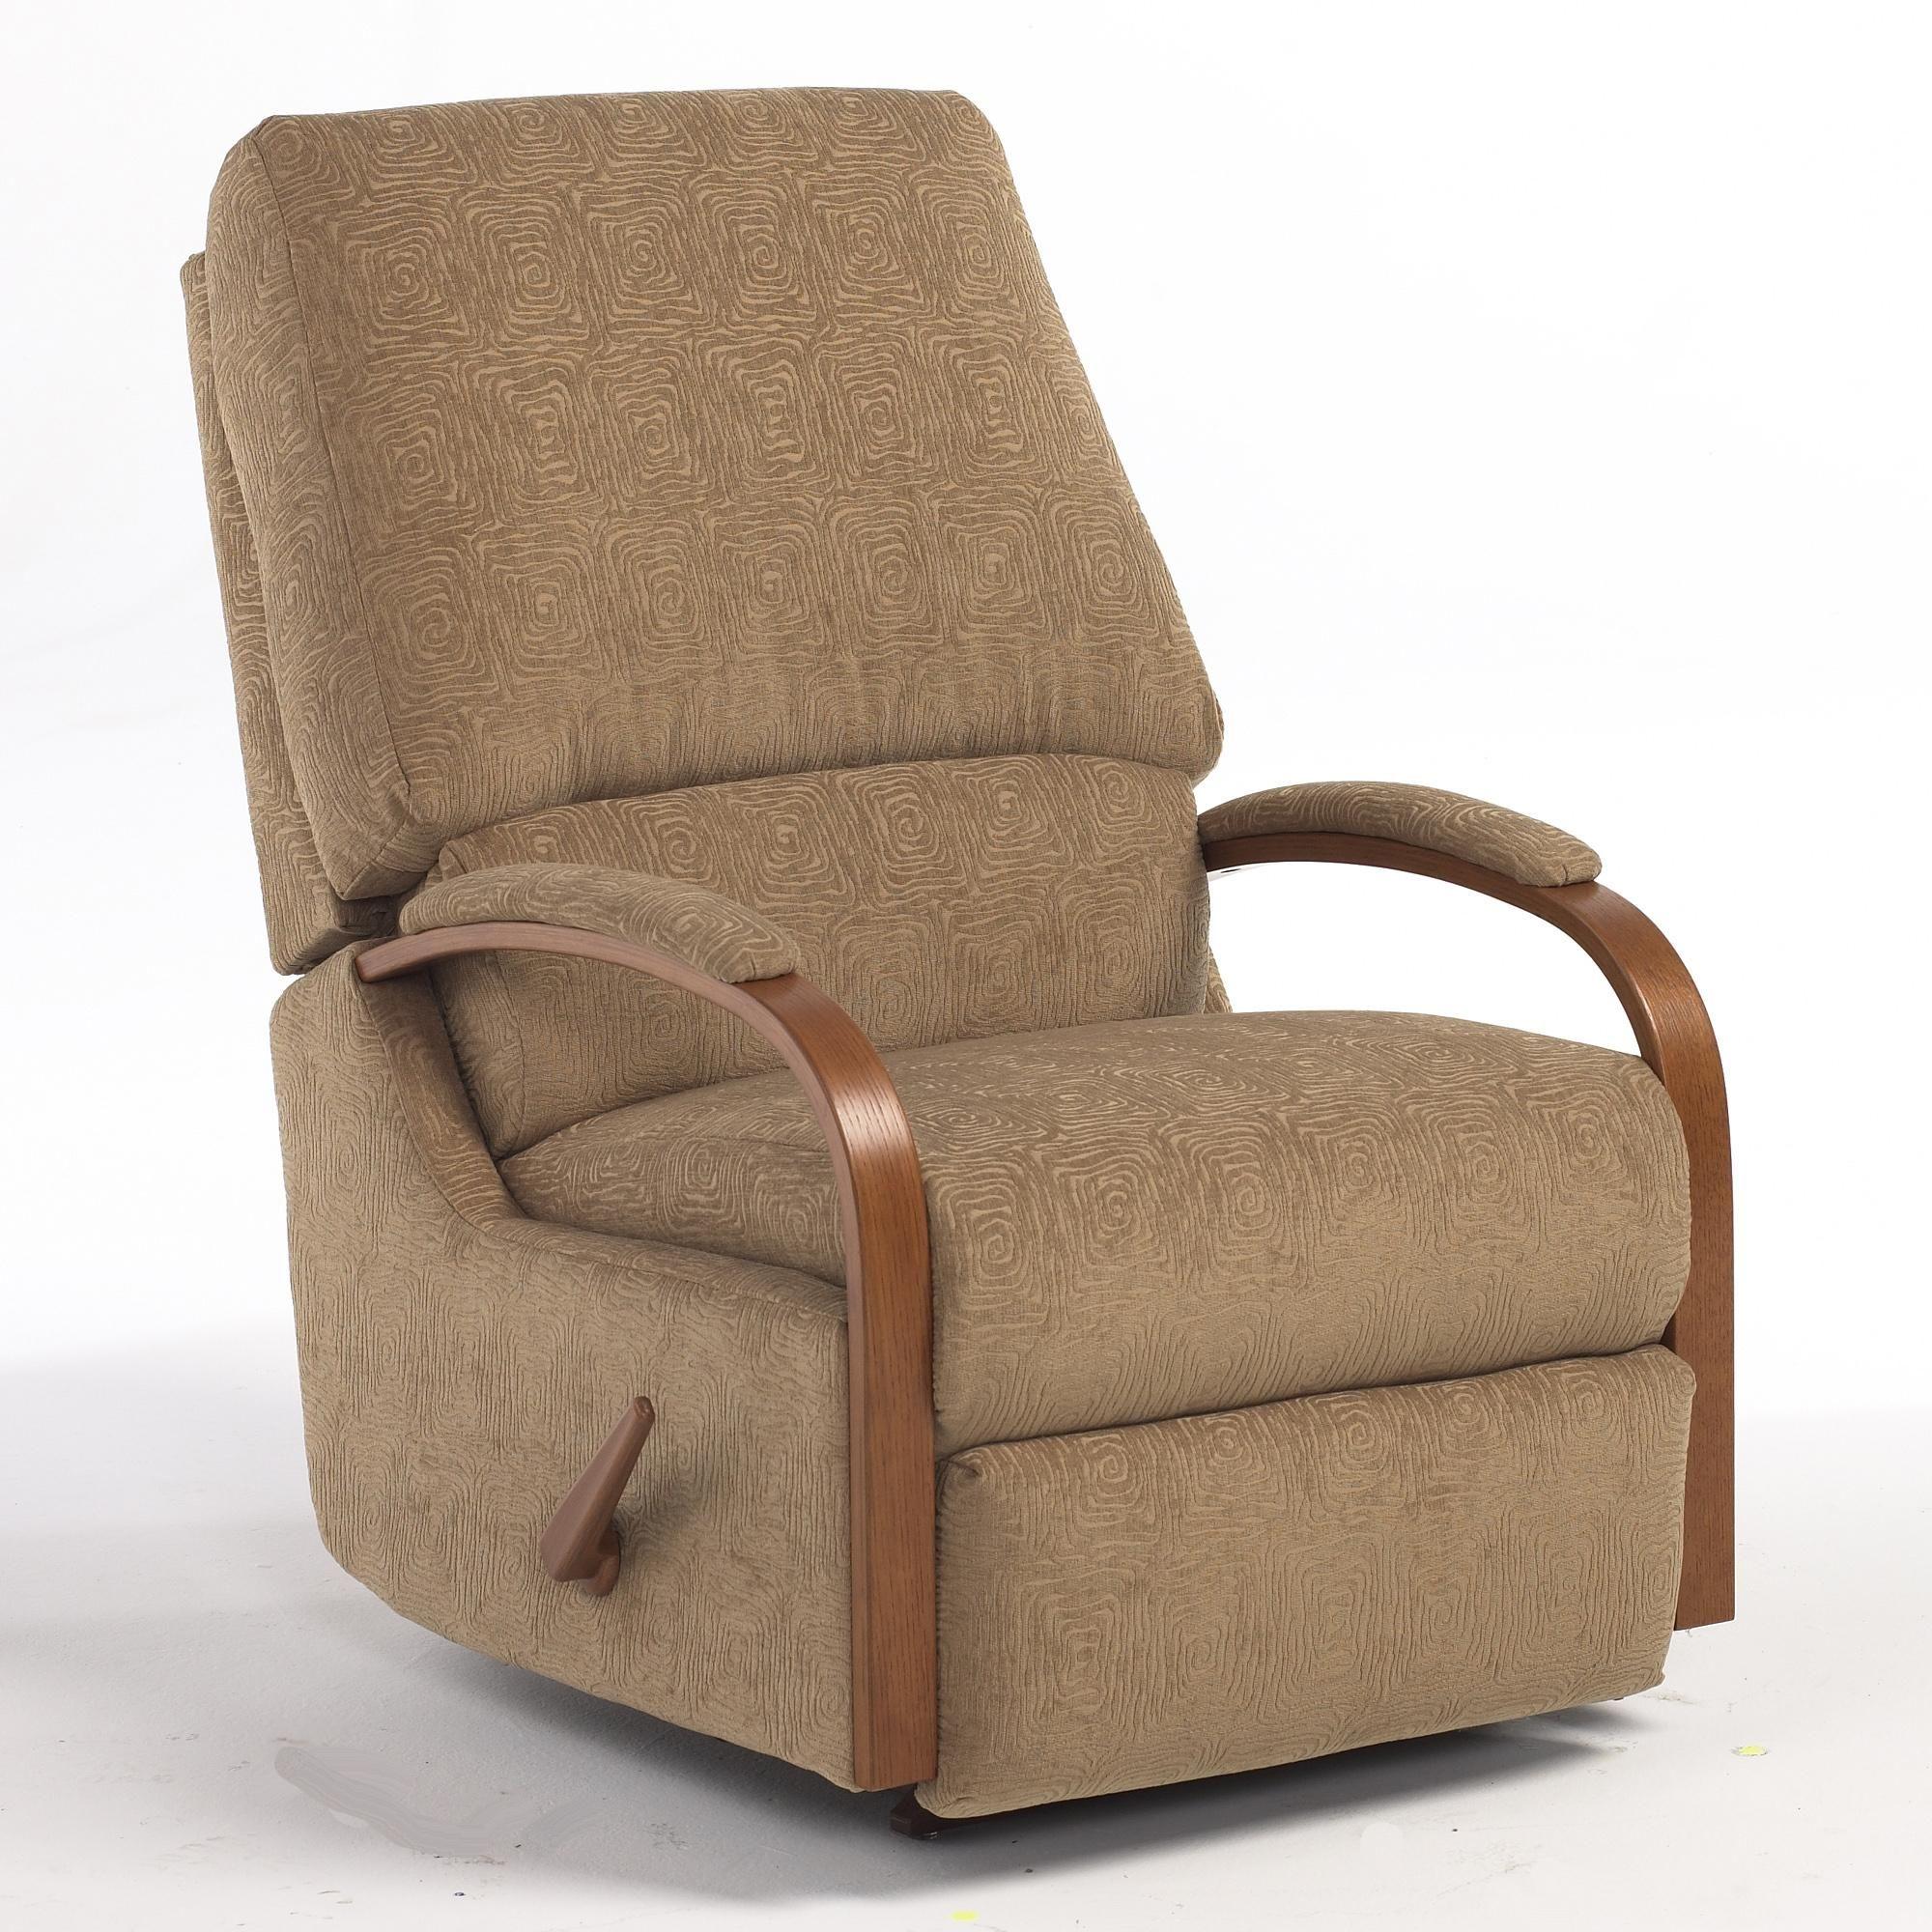 Pike Swivel Rocker Recliner Upholstered chairs, Swivel